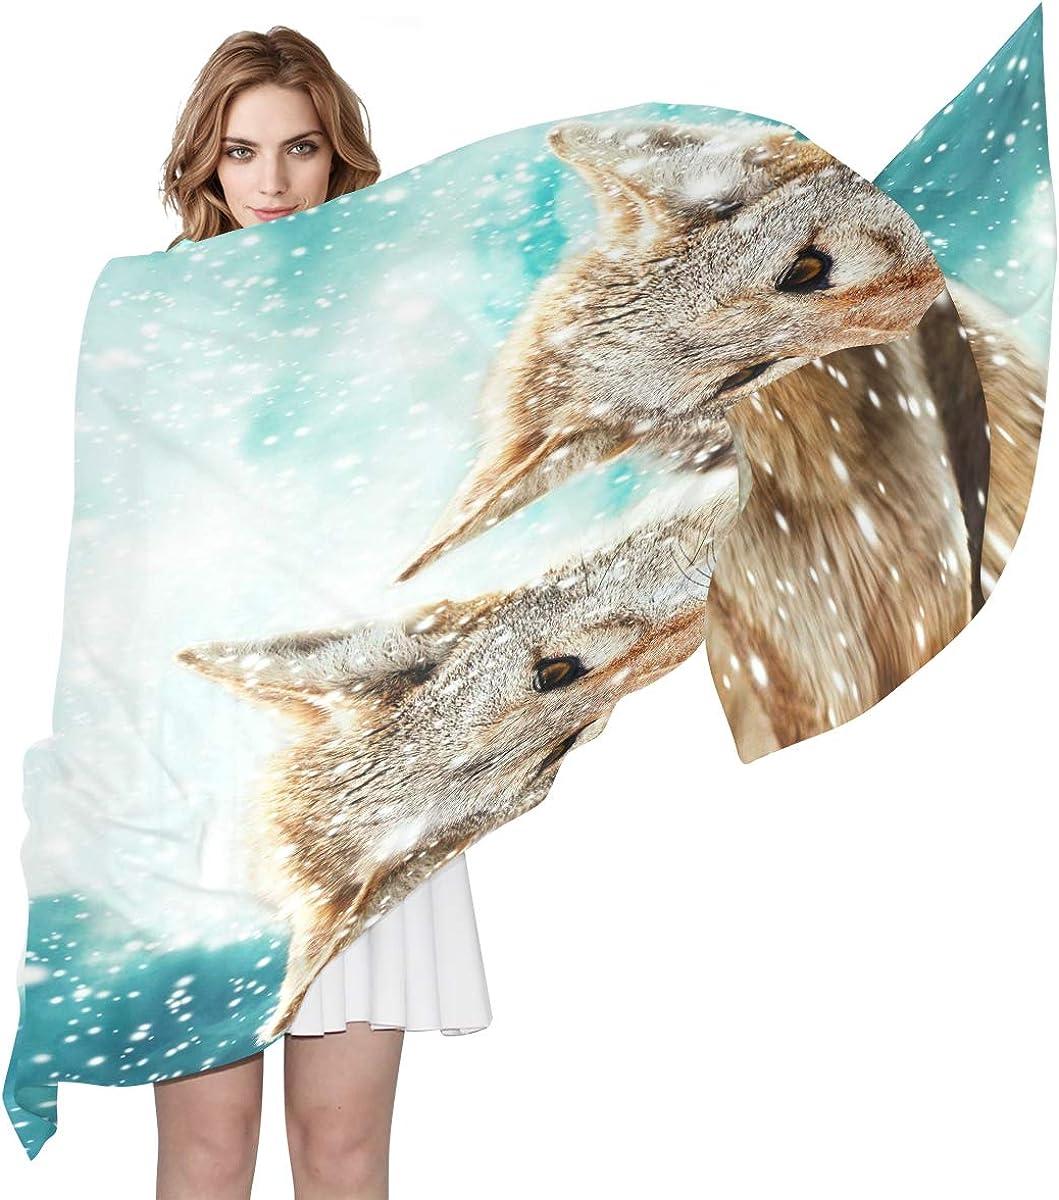 XLING Fashion Scarf Animal Wolf Winter Snowflake Long Lightweight Sunscreen Scarf Shawl Wrap Muffler Neckerchief for Women Men